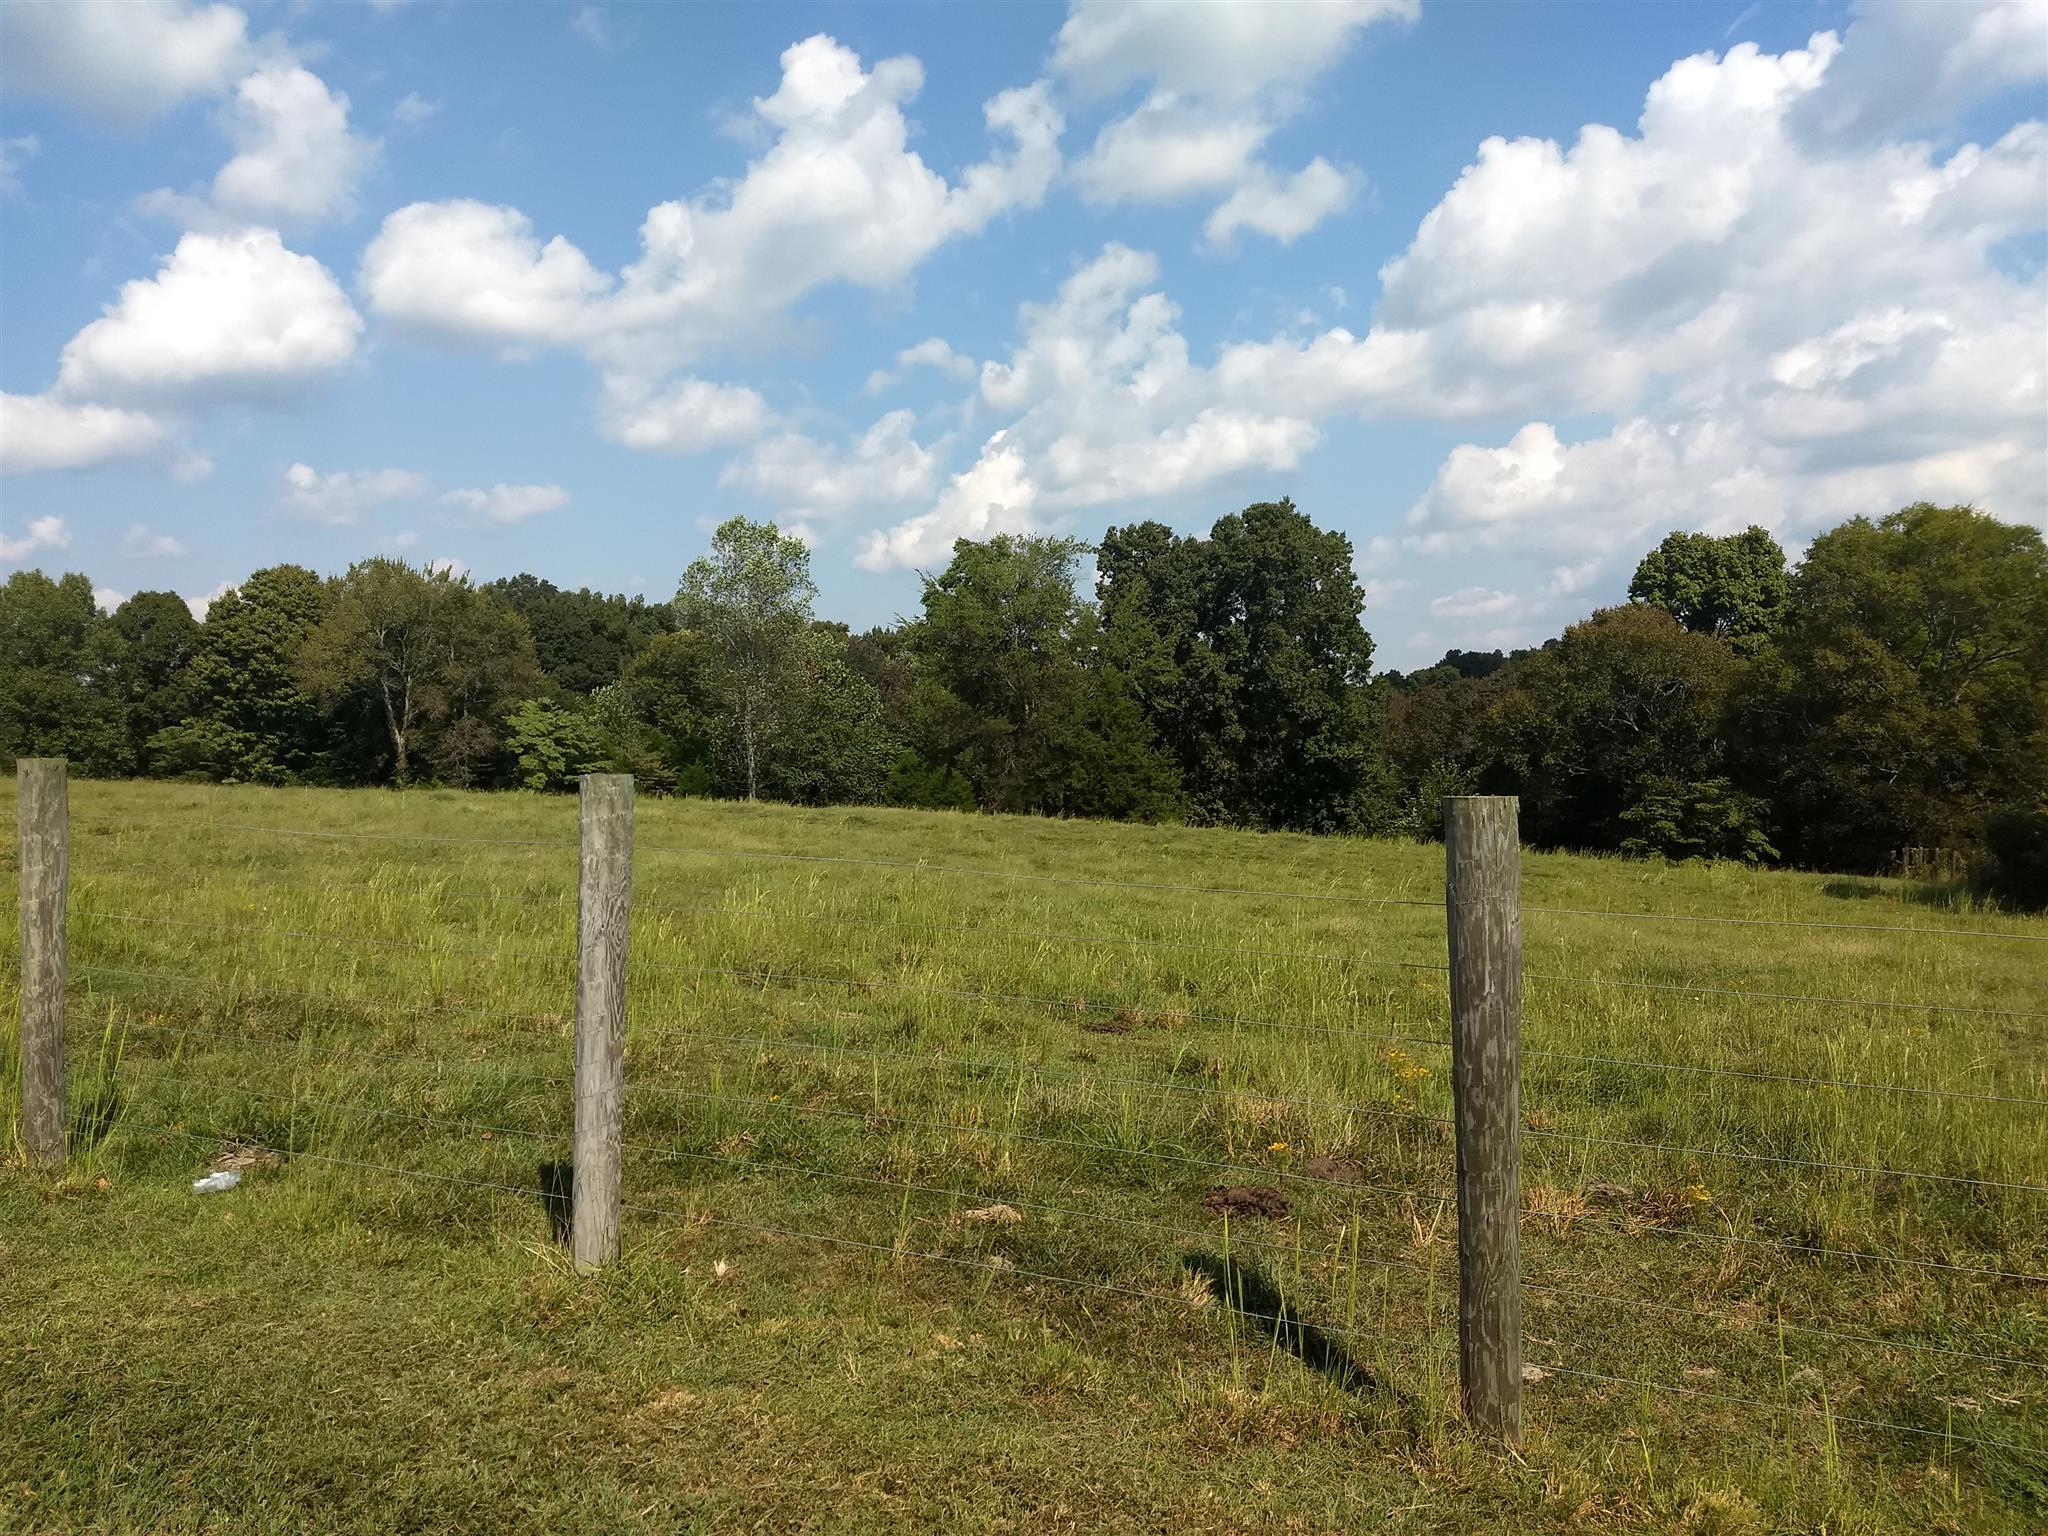 2201 Lock B Rd N, Clarksville, TN 37043 - Clarksville, TN real estate listing